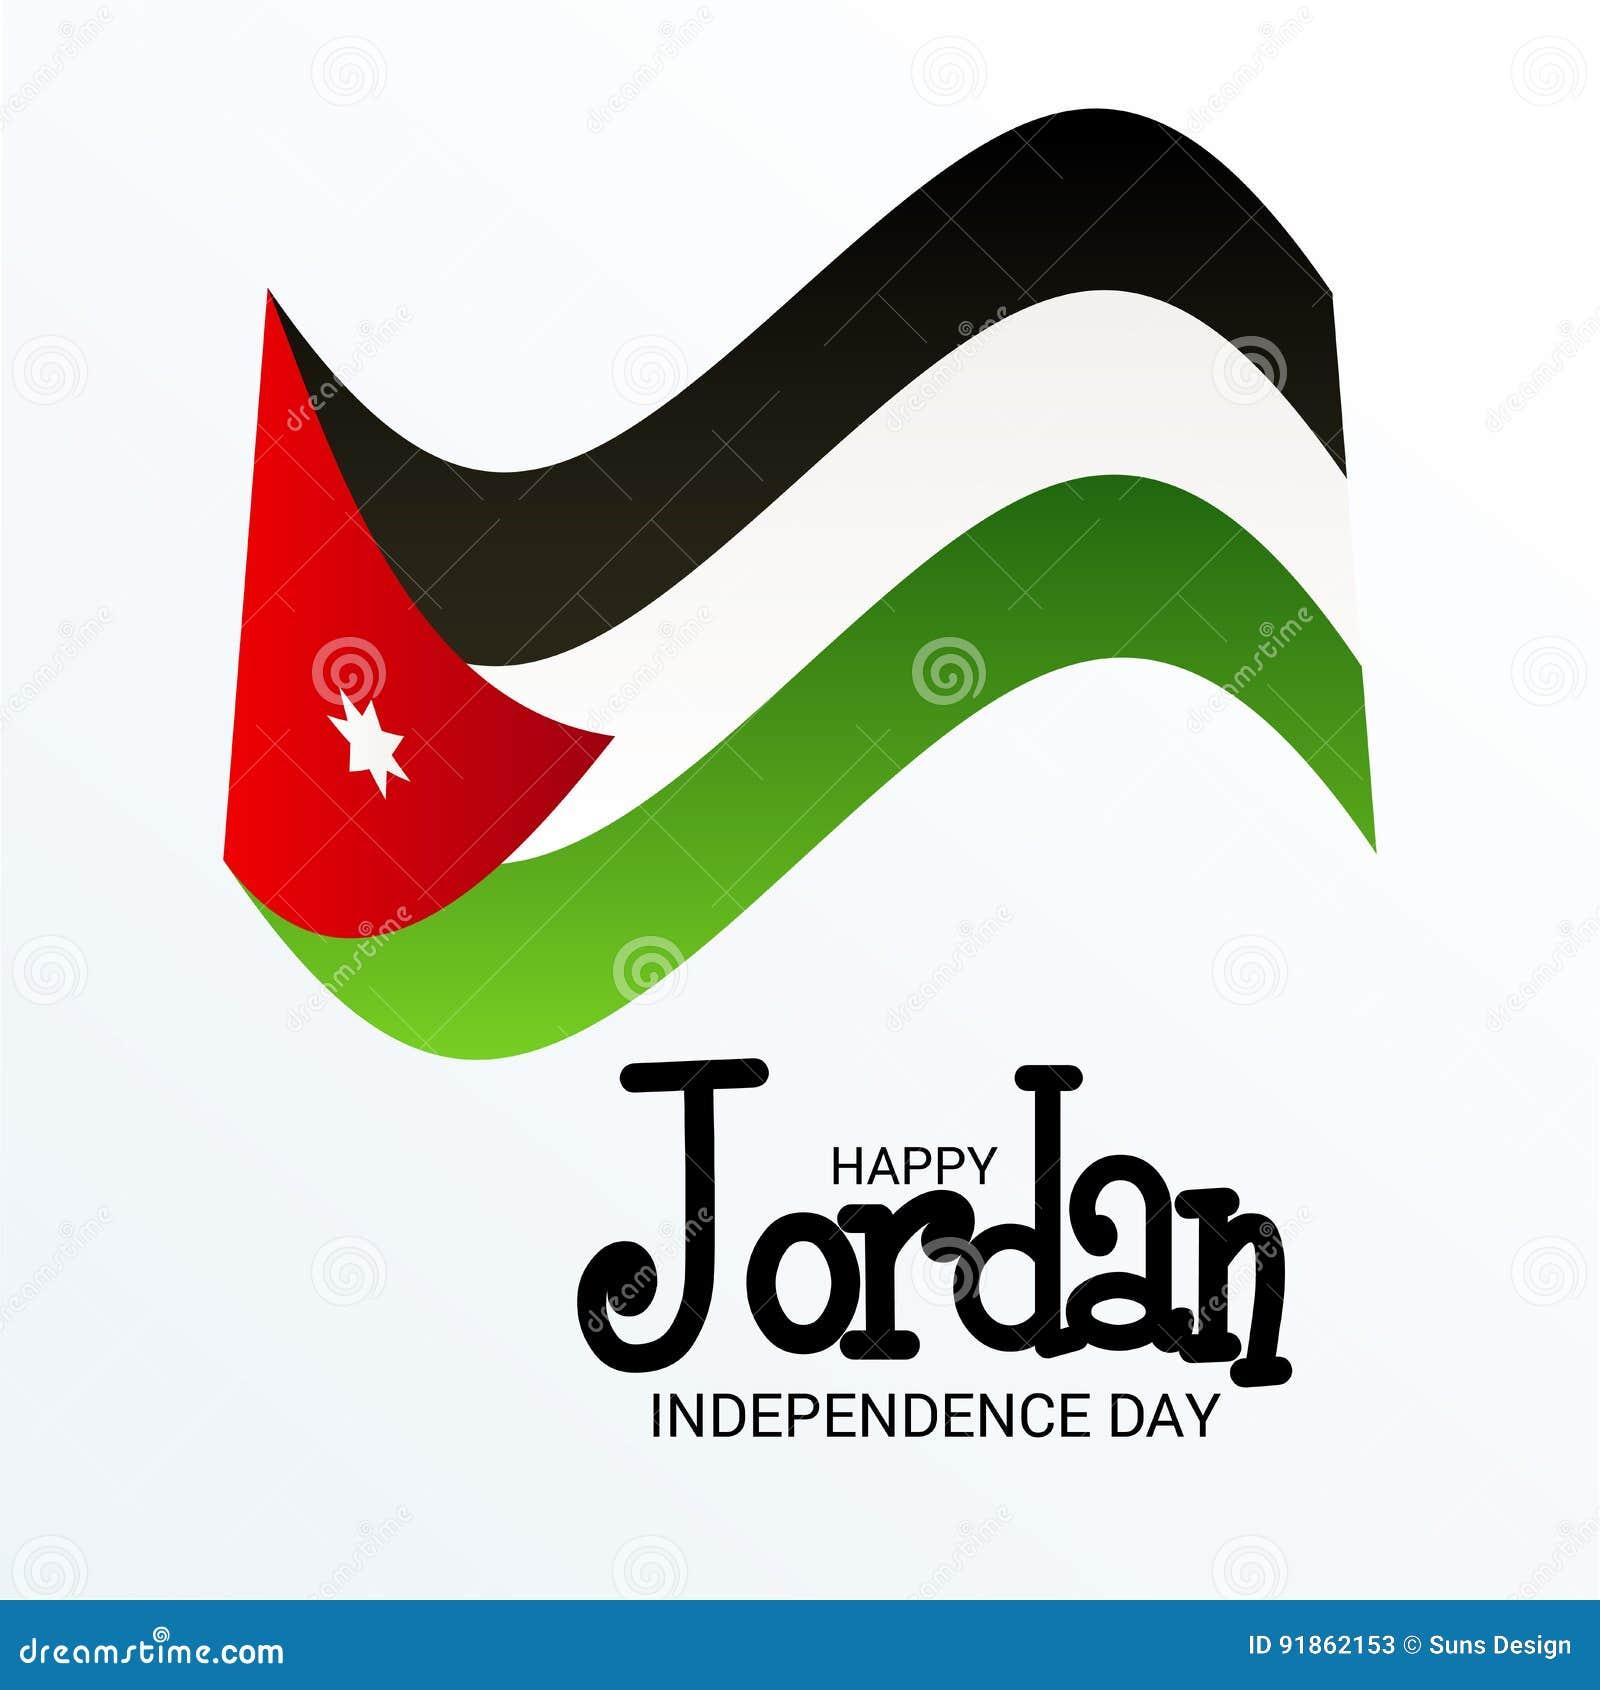 Jordan Independence Day Stock Illustration Illustration Of Travel